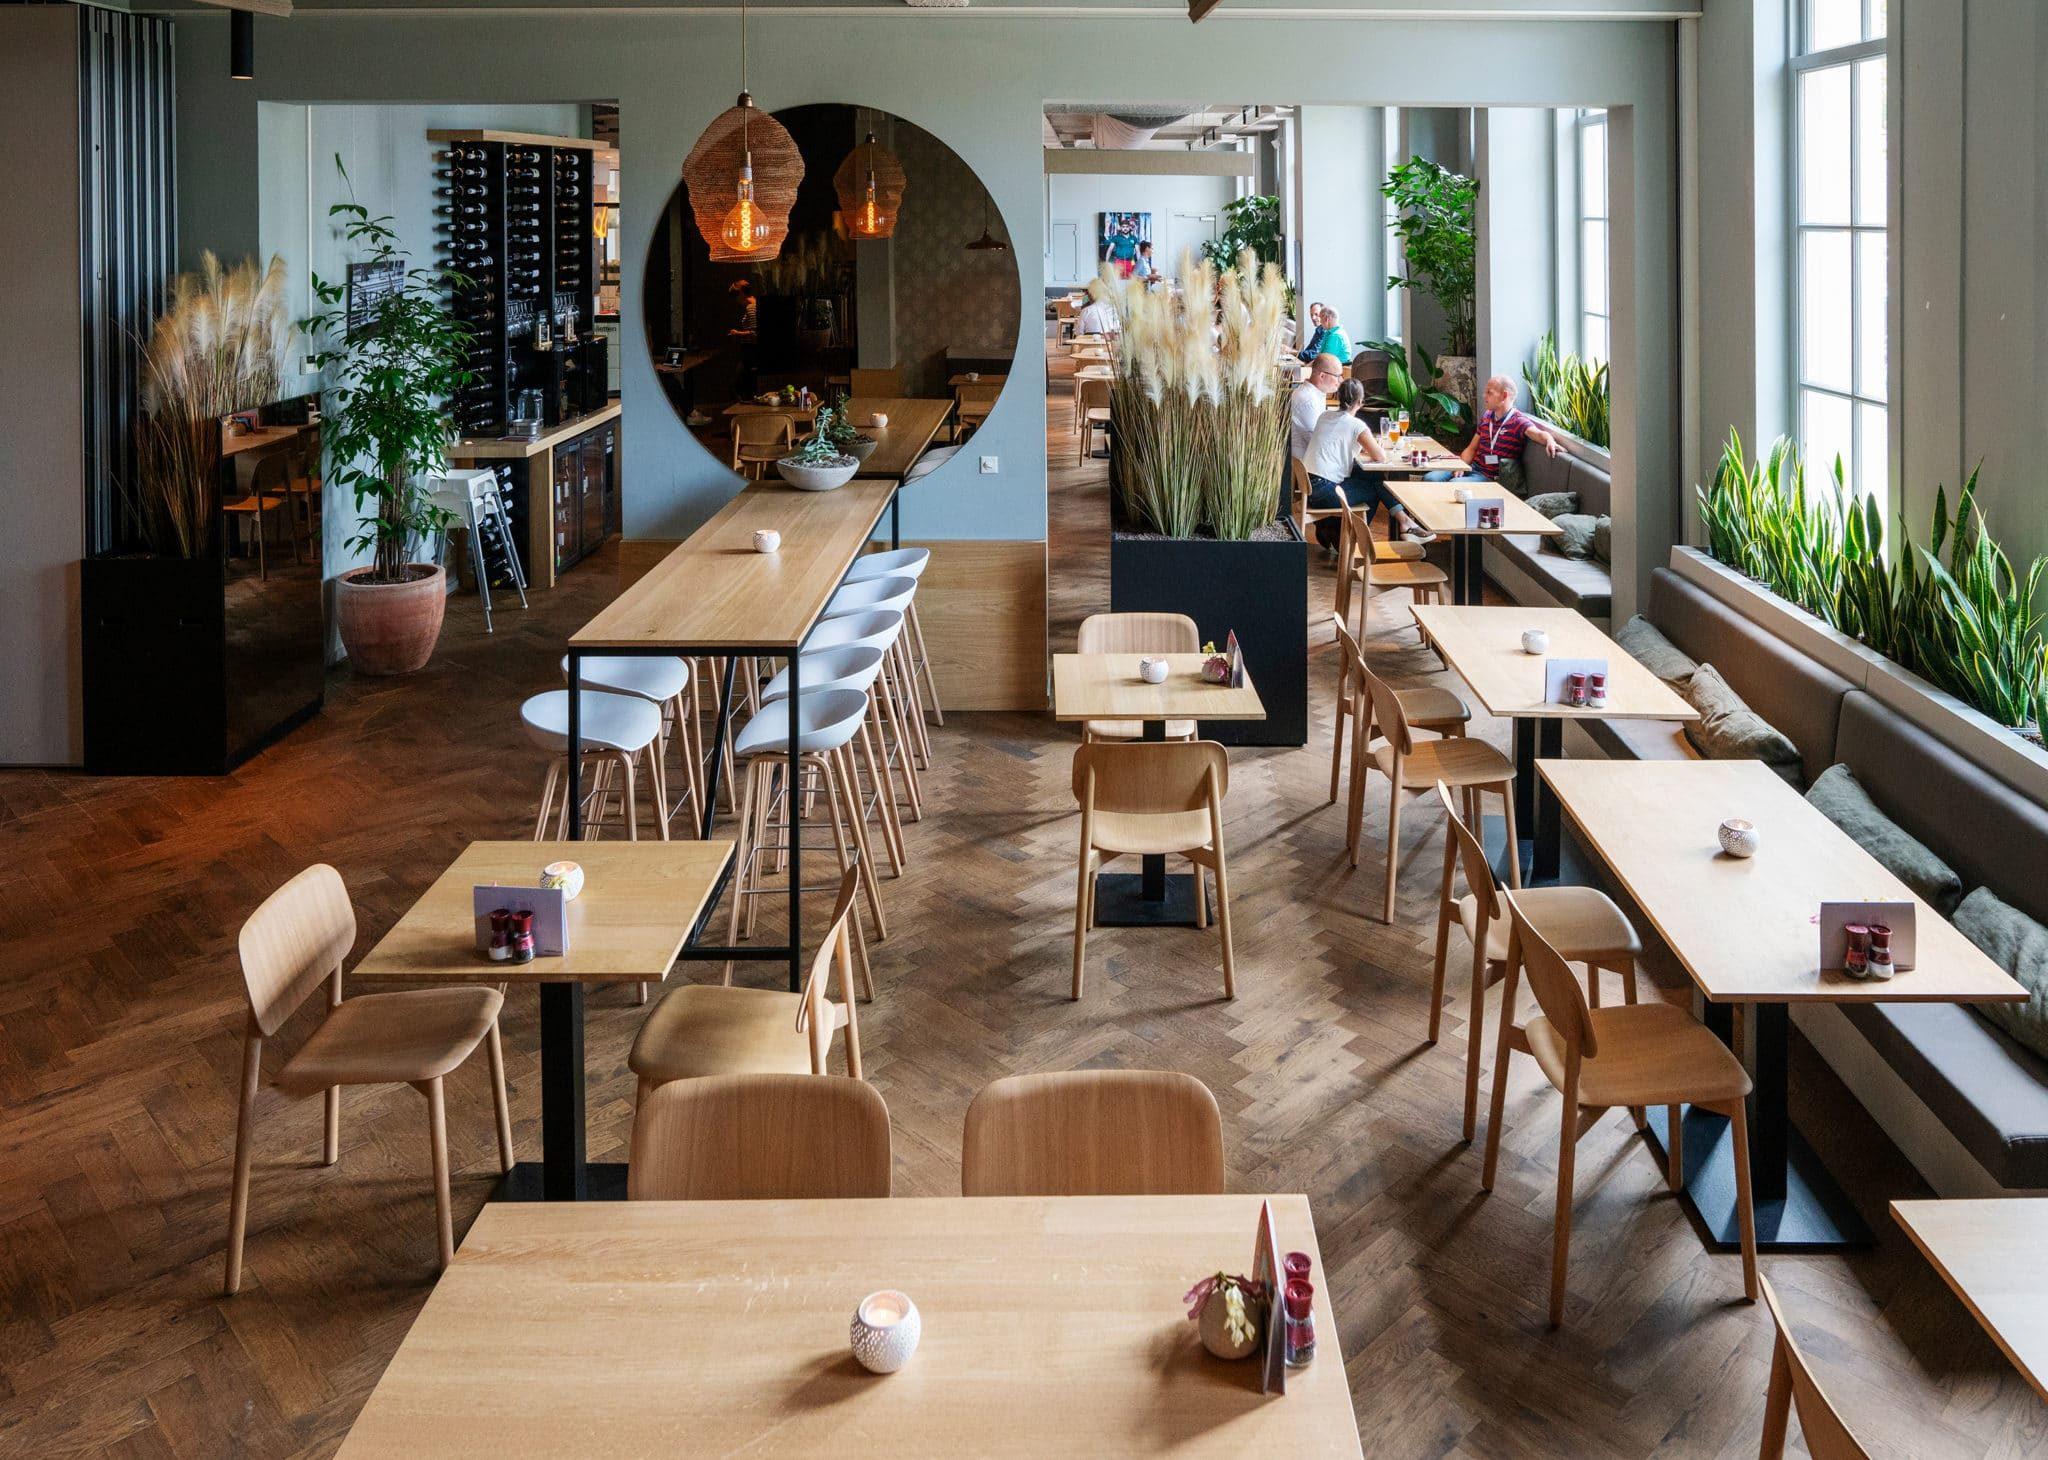 Overview and dishes of 'de Utrechter' by: Serge Ligtenberg